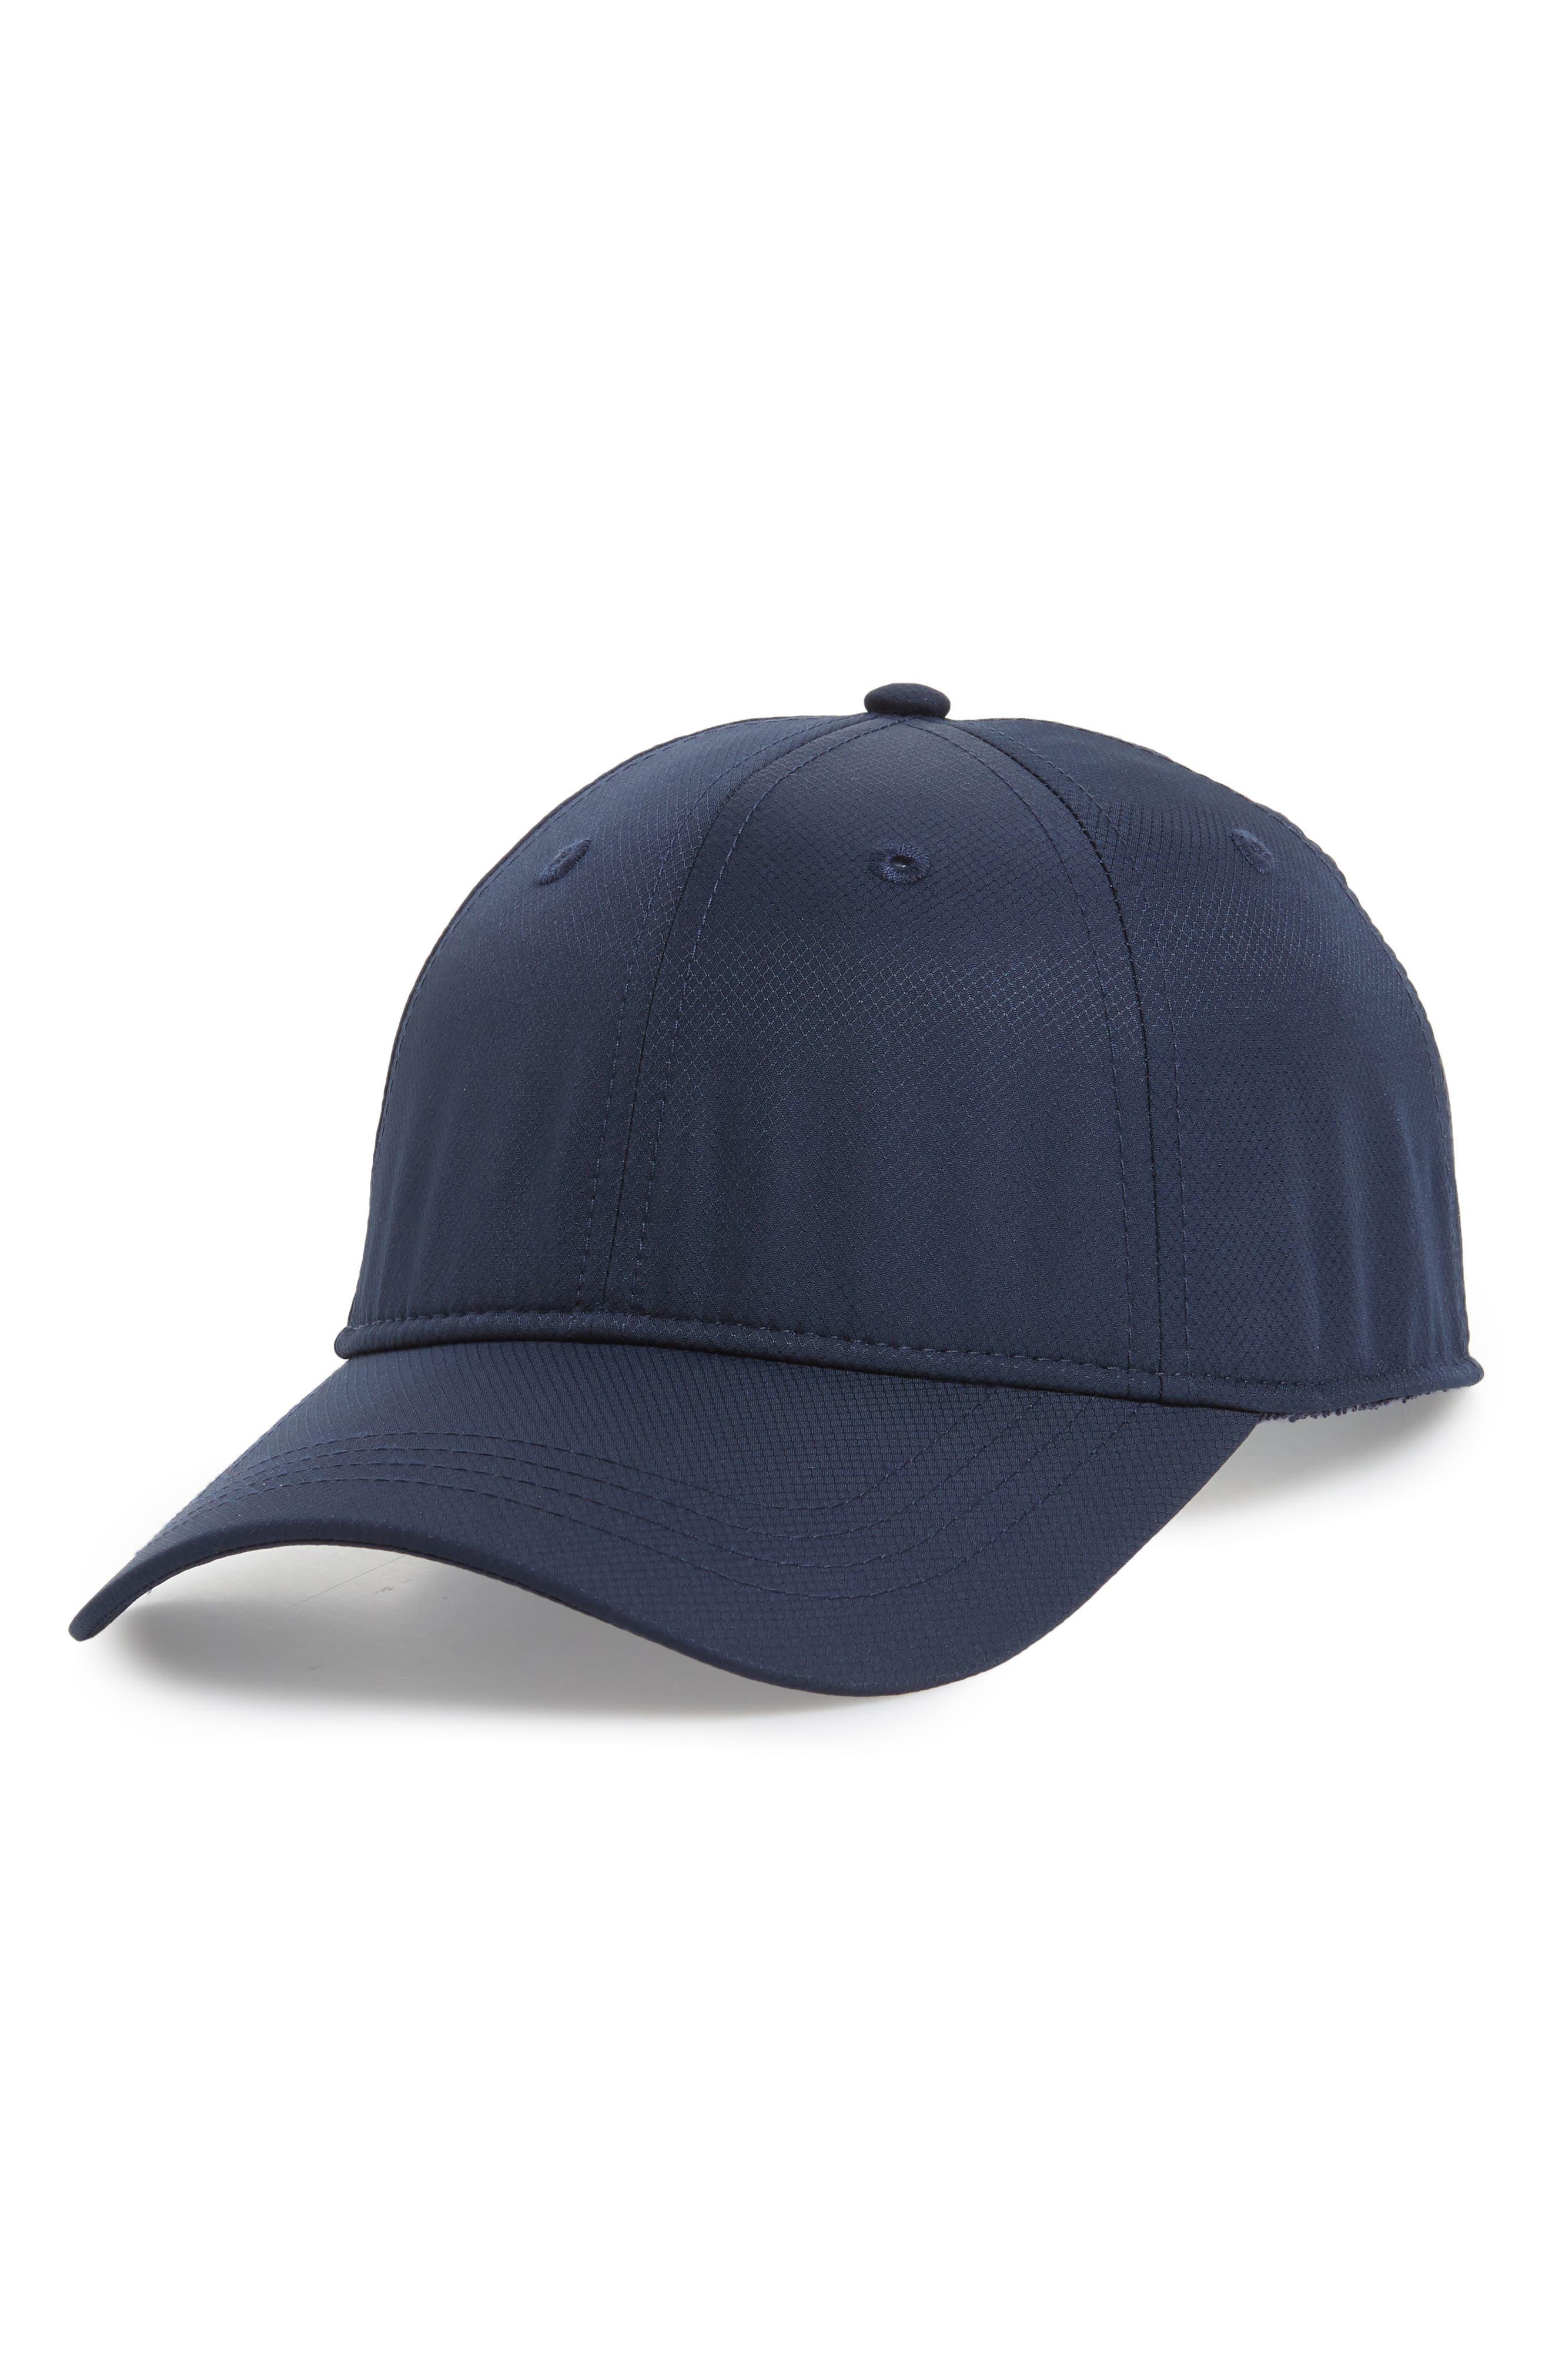 Sport Baseball Cap,                         Main,                         color, Navy Blue